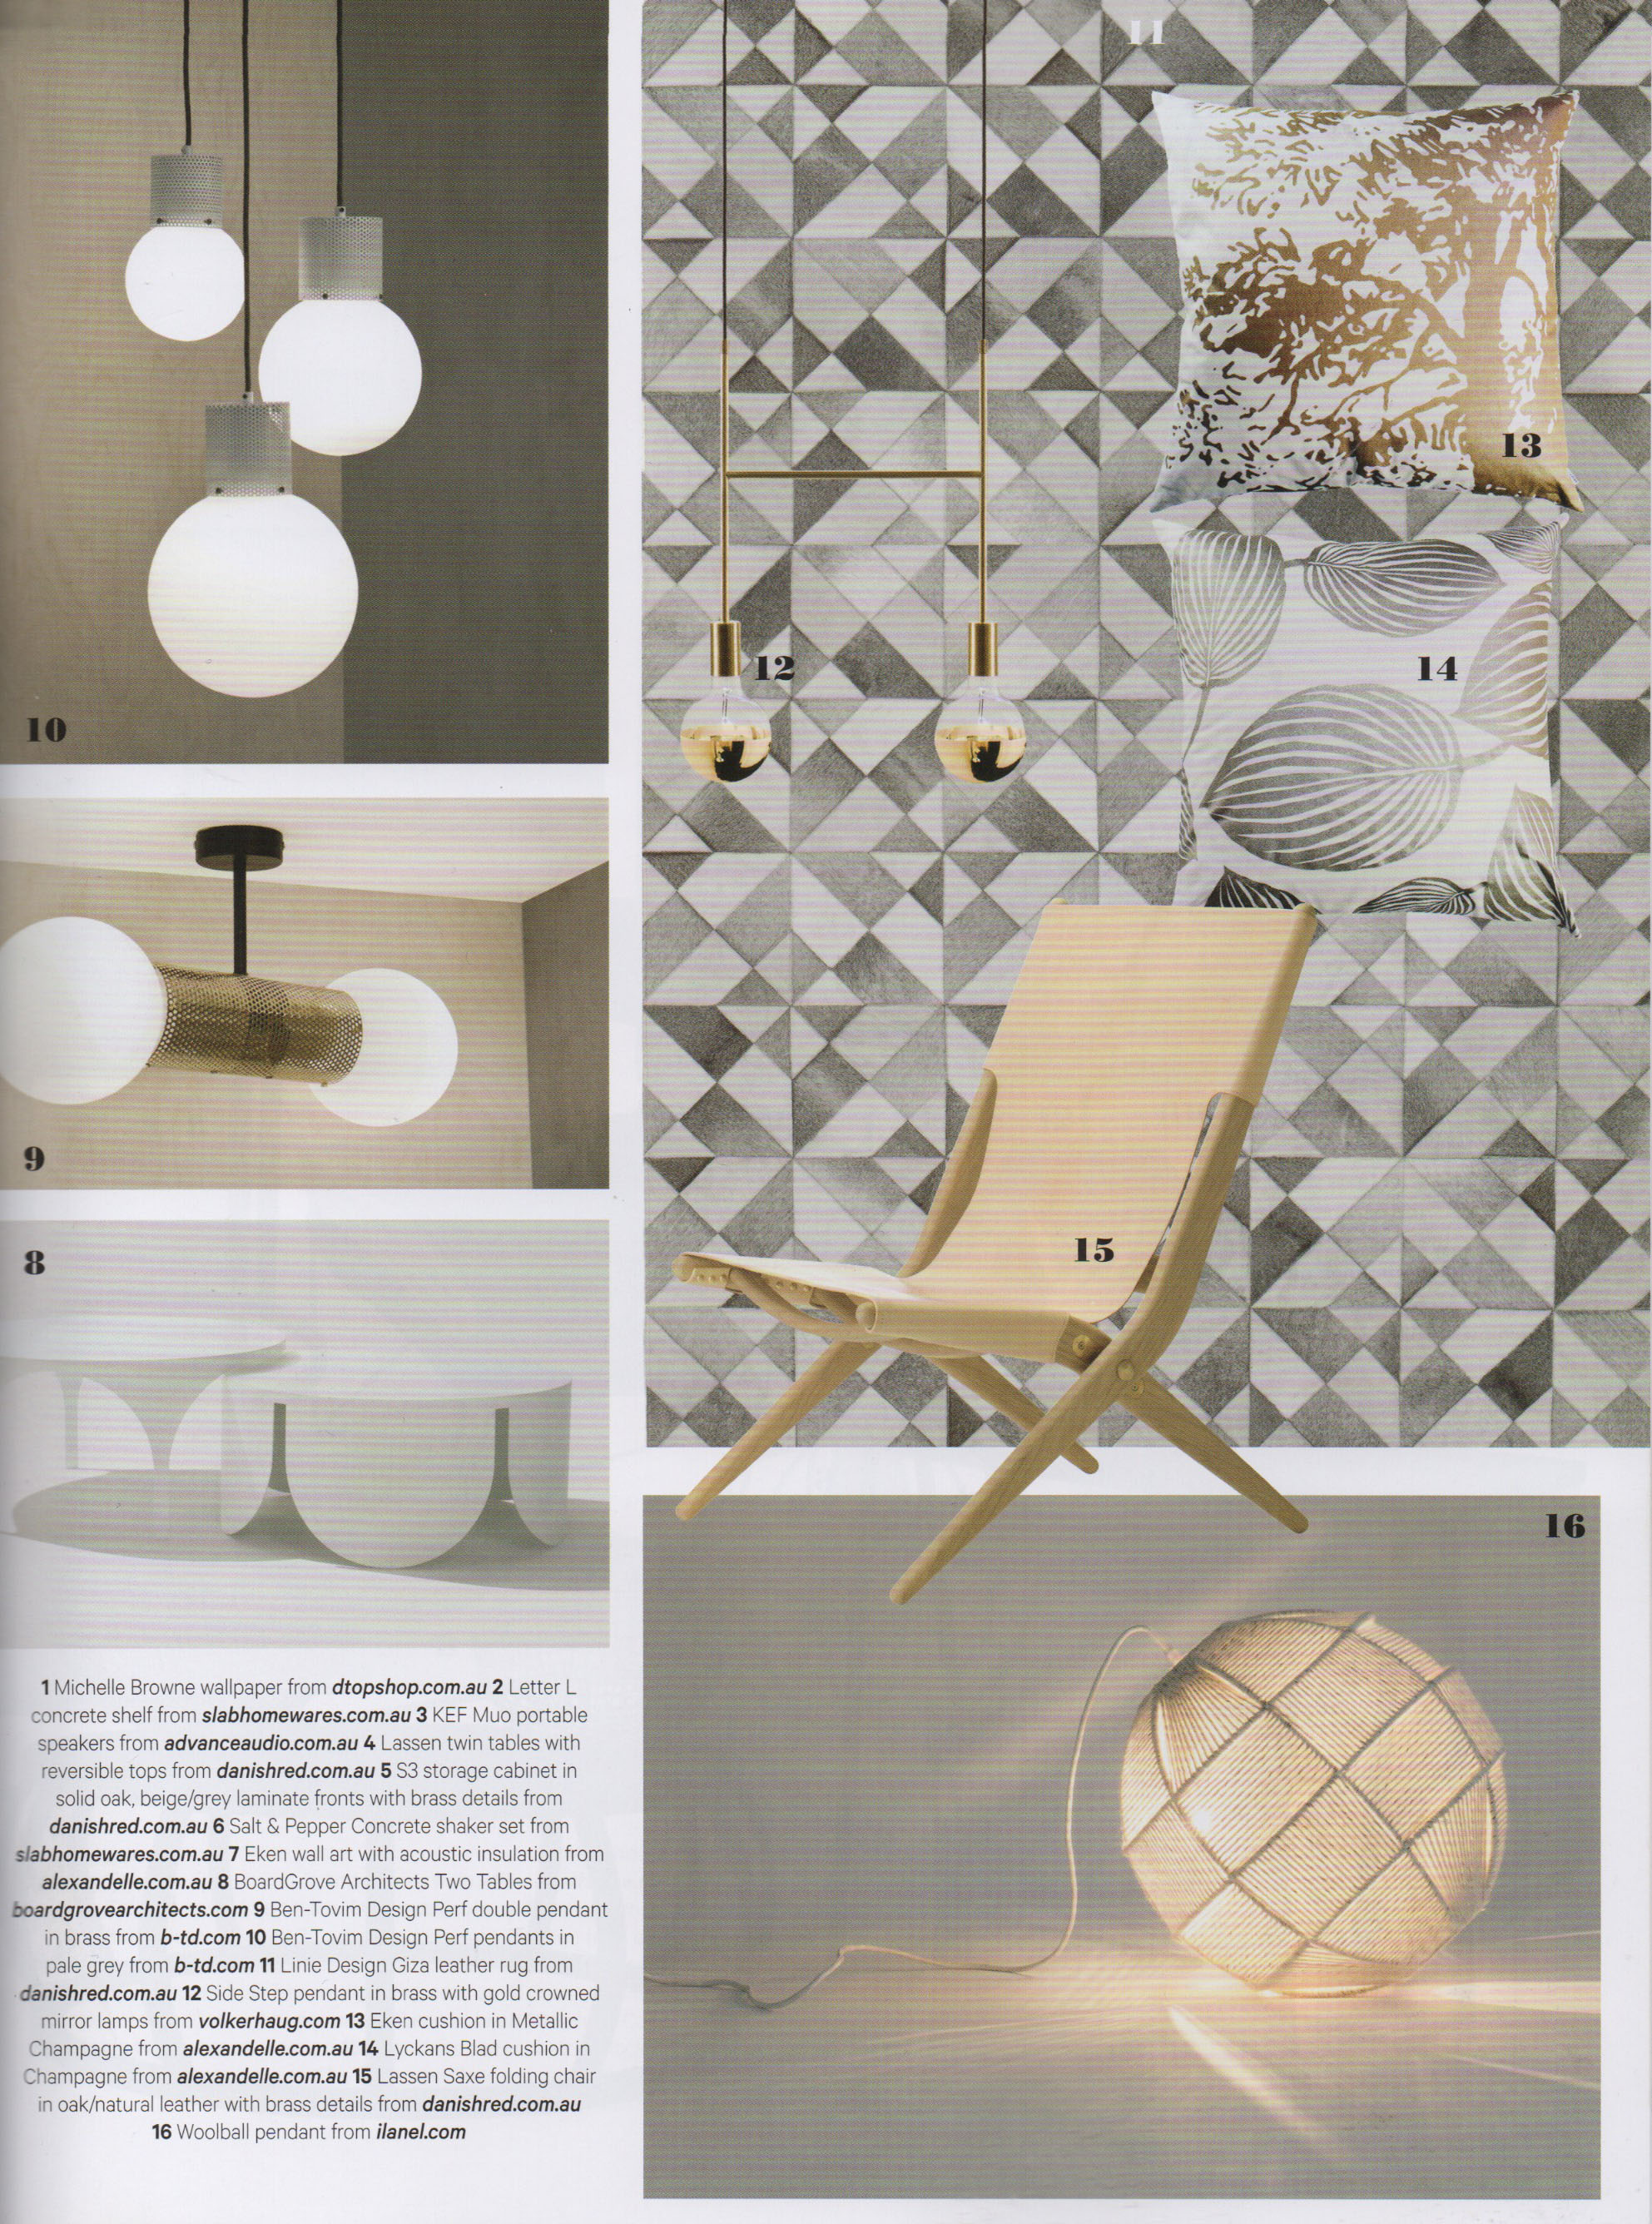 Ilanel - Home Design - Vol 19 No 4 - pg 65.jpg